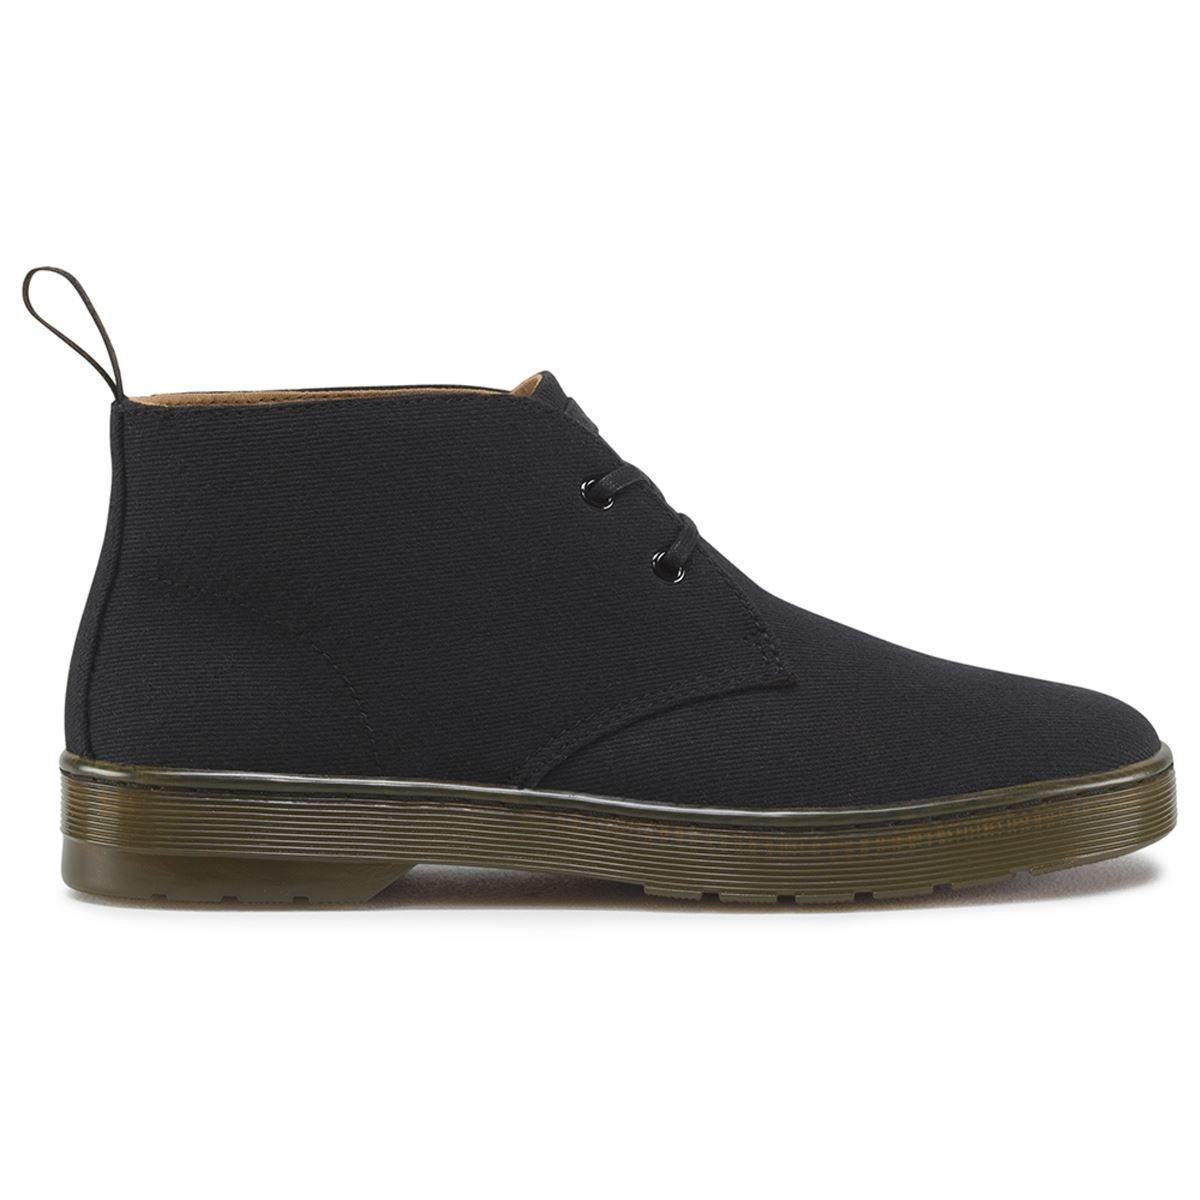 Dr. Martens Men's Mayport Chukka Boot, Black, 8 UK/9 D US